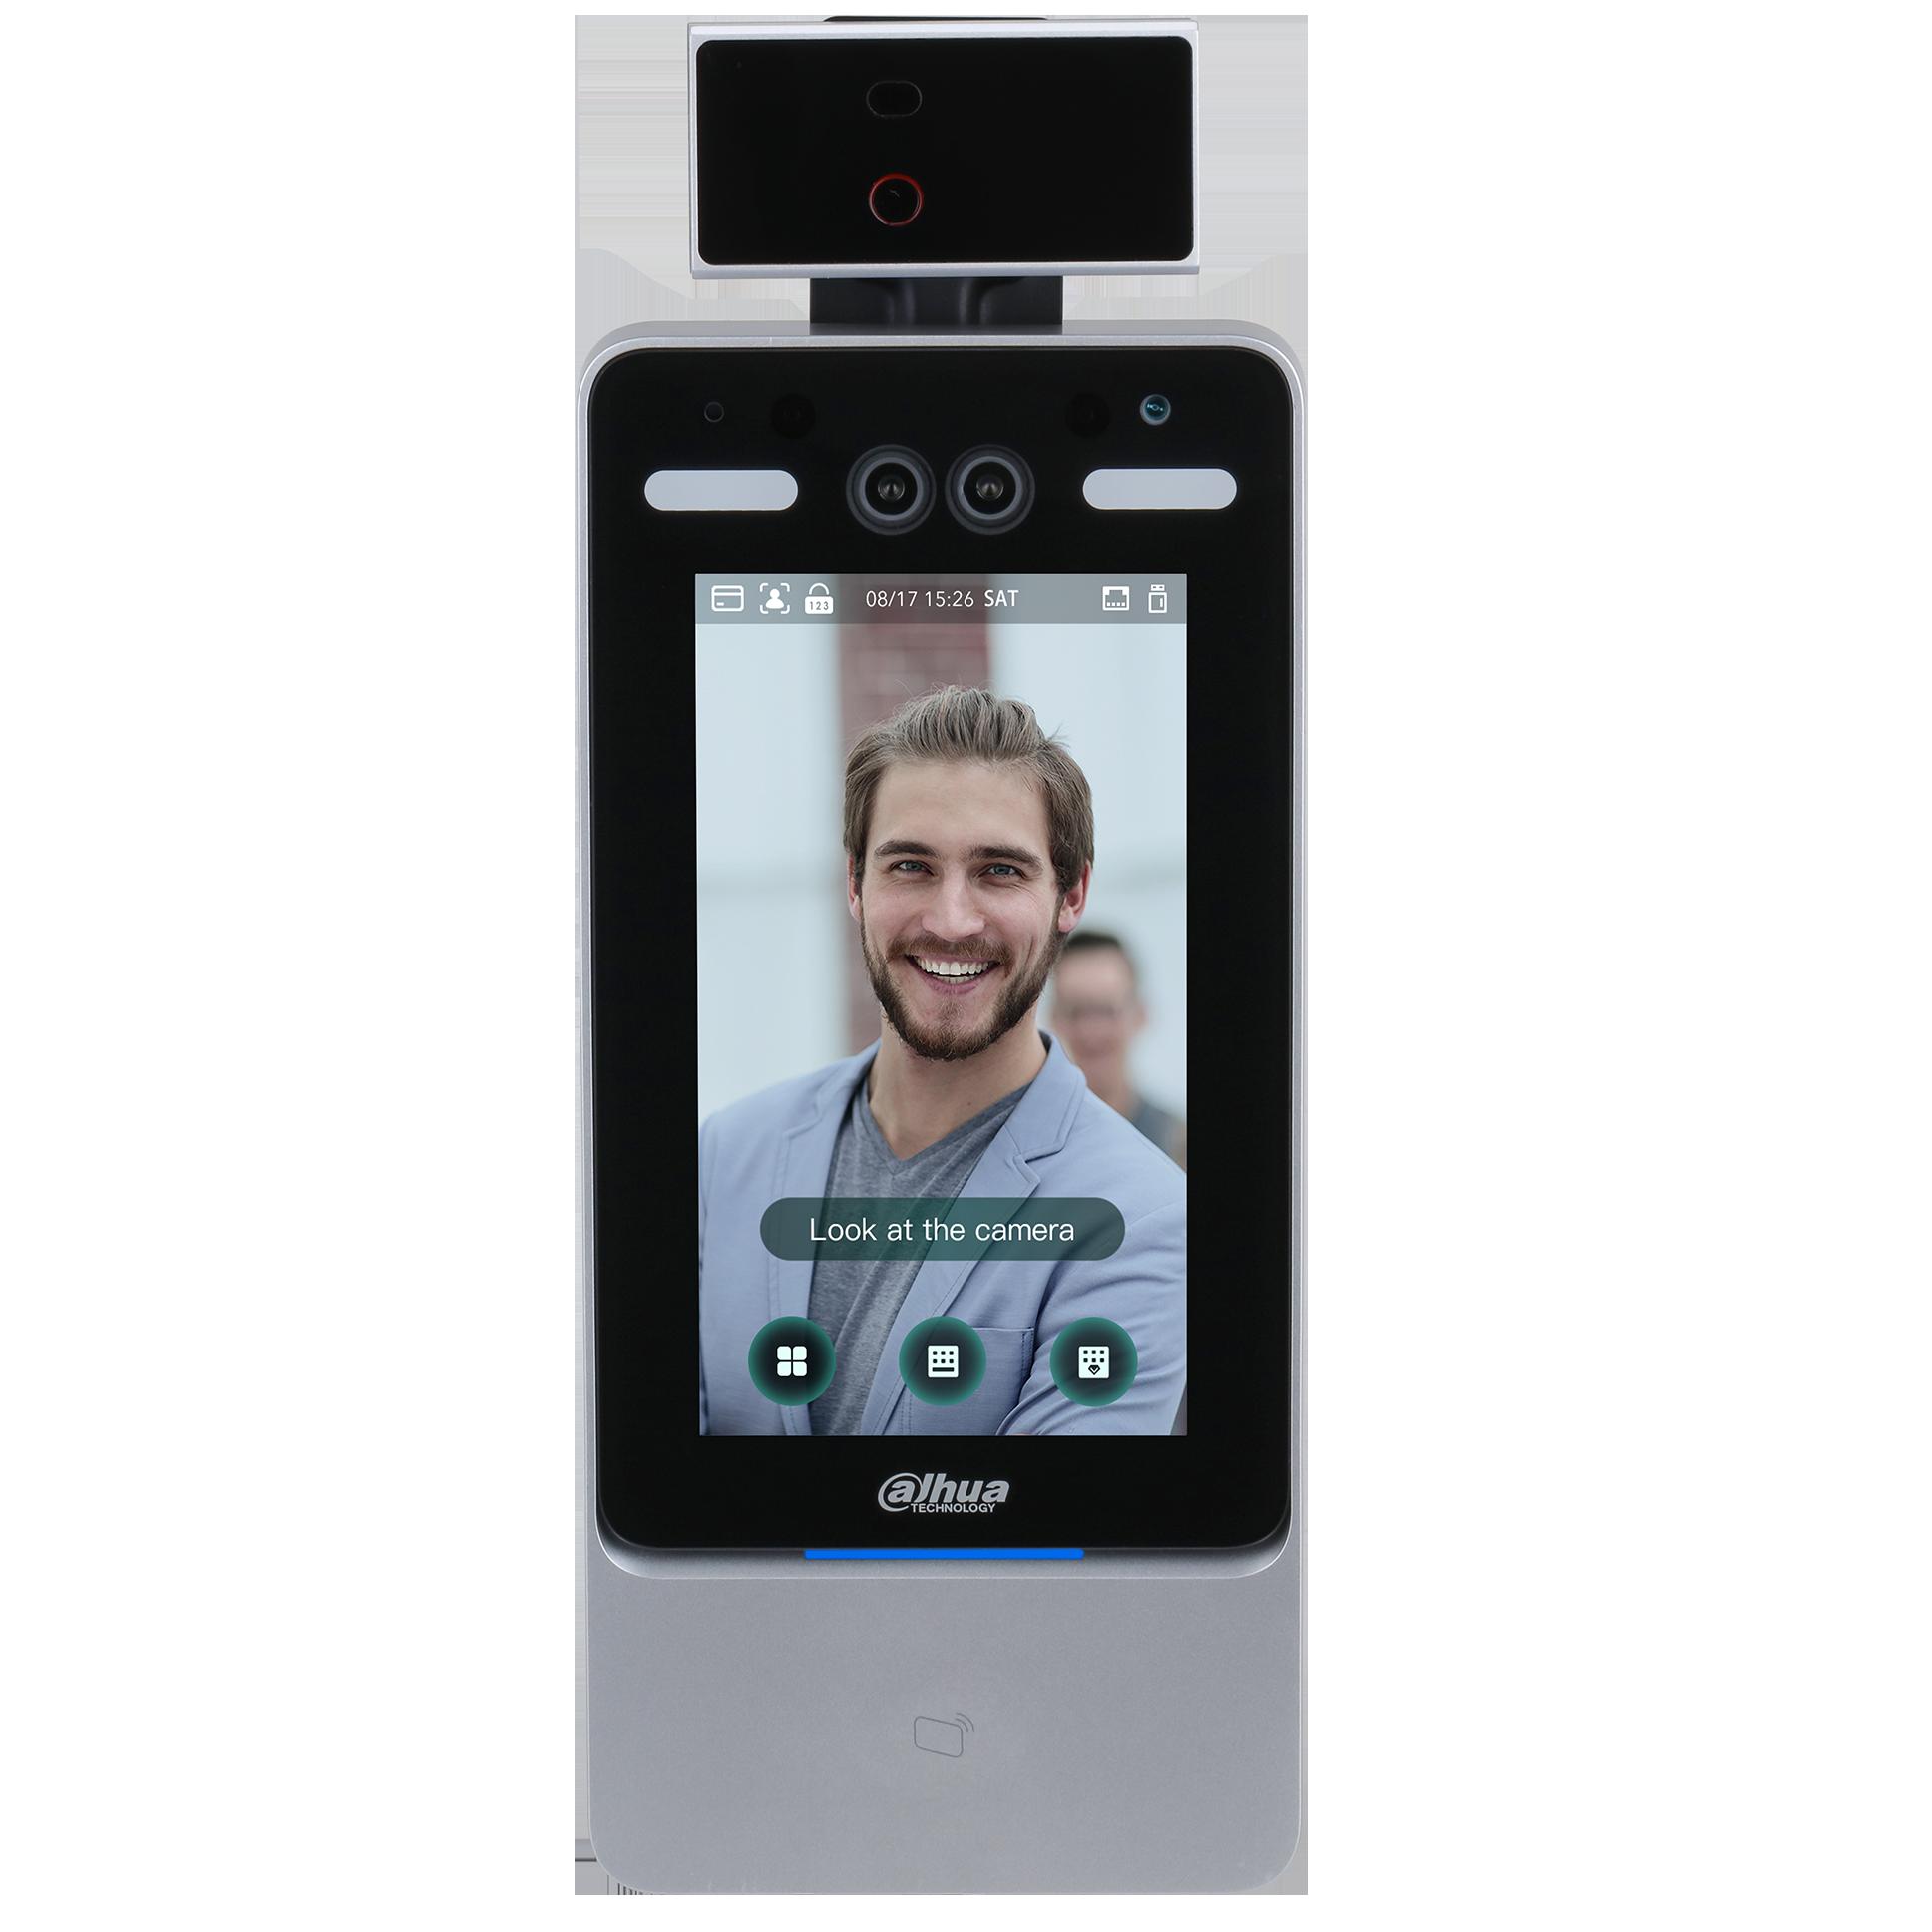 発熱検知付き顔認証端末